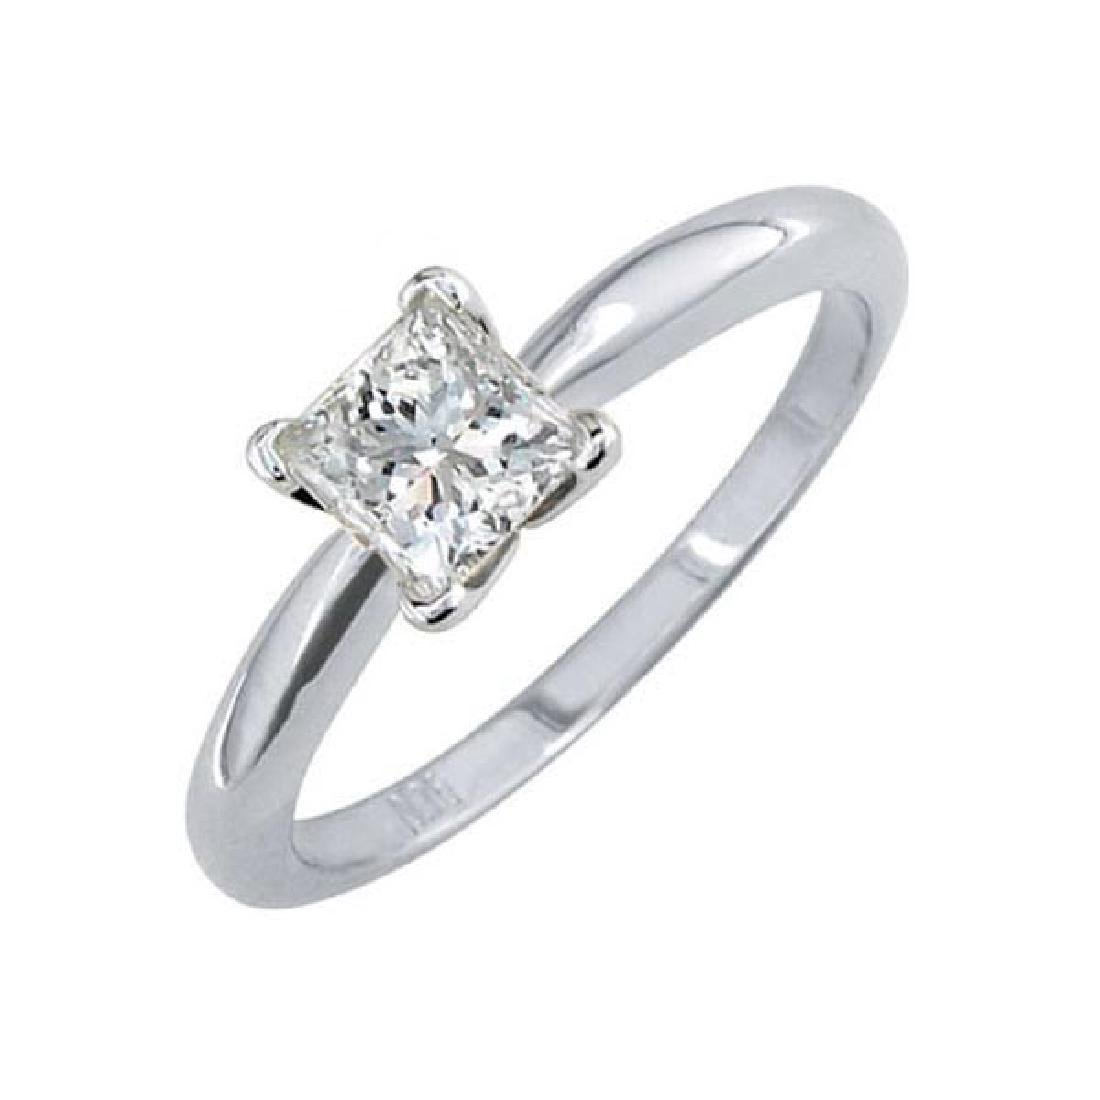 Certified 0.9 CTW Princess Diamond Solitaire 14k Ring G